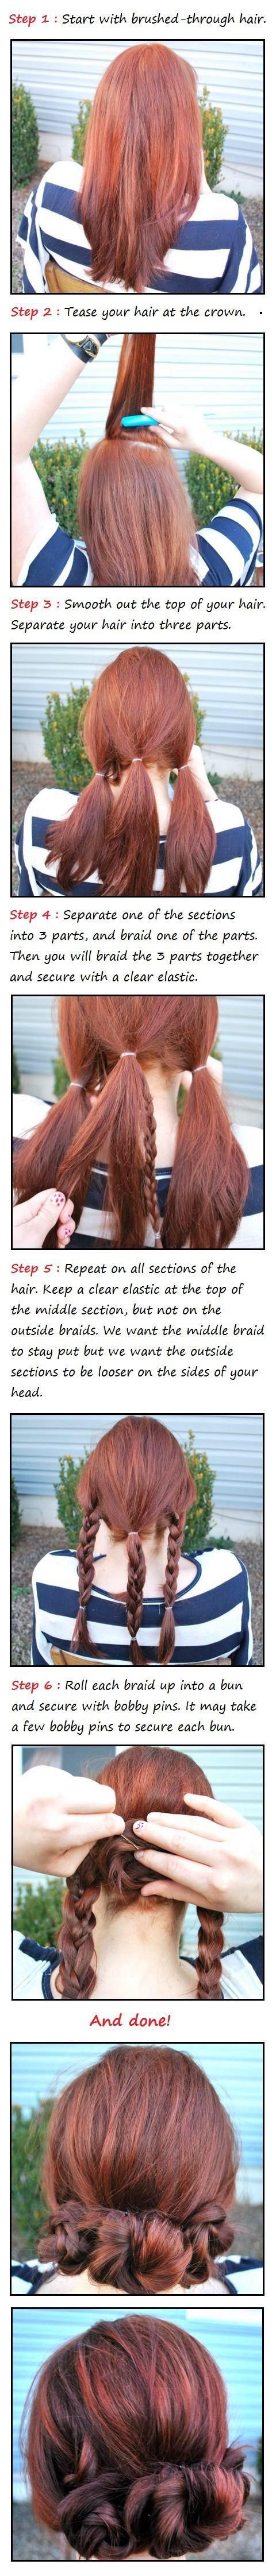 12 mejores imágenes de Hair en Pinterest